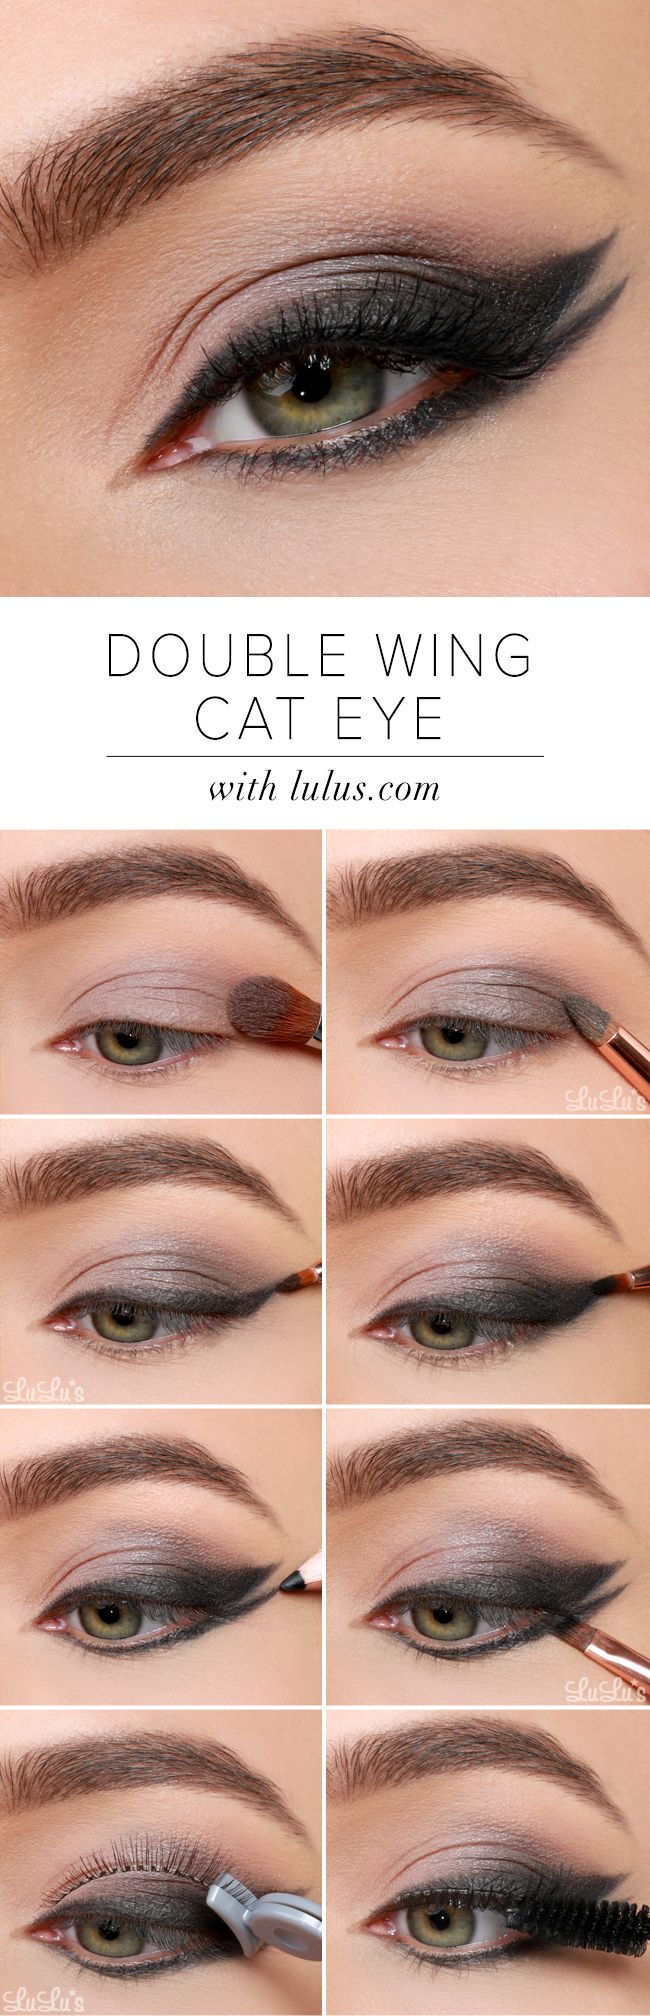 Double winged Glamorous, Black smokey Eye makeup tutorial